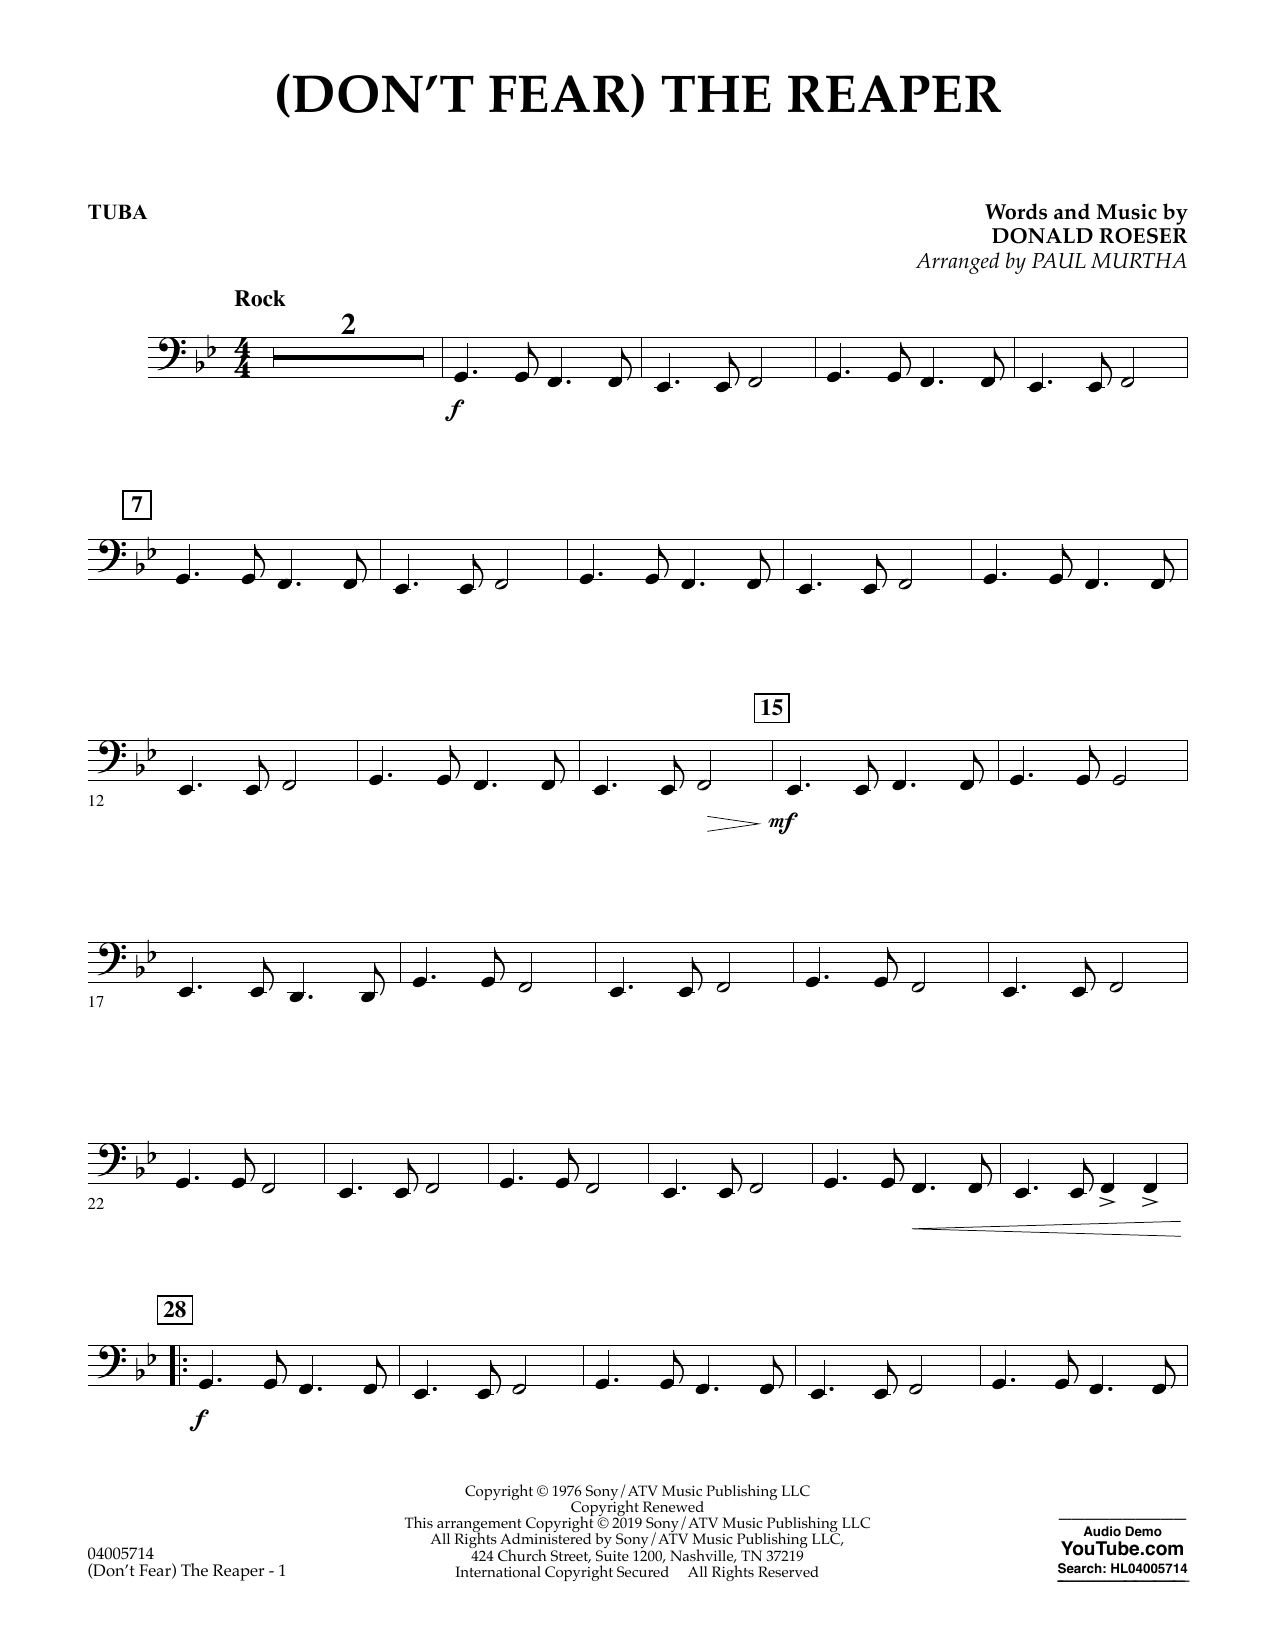 (Don't Fear) The Reaper (arr. Paul Murtha) - Tuba (Concert Band)